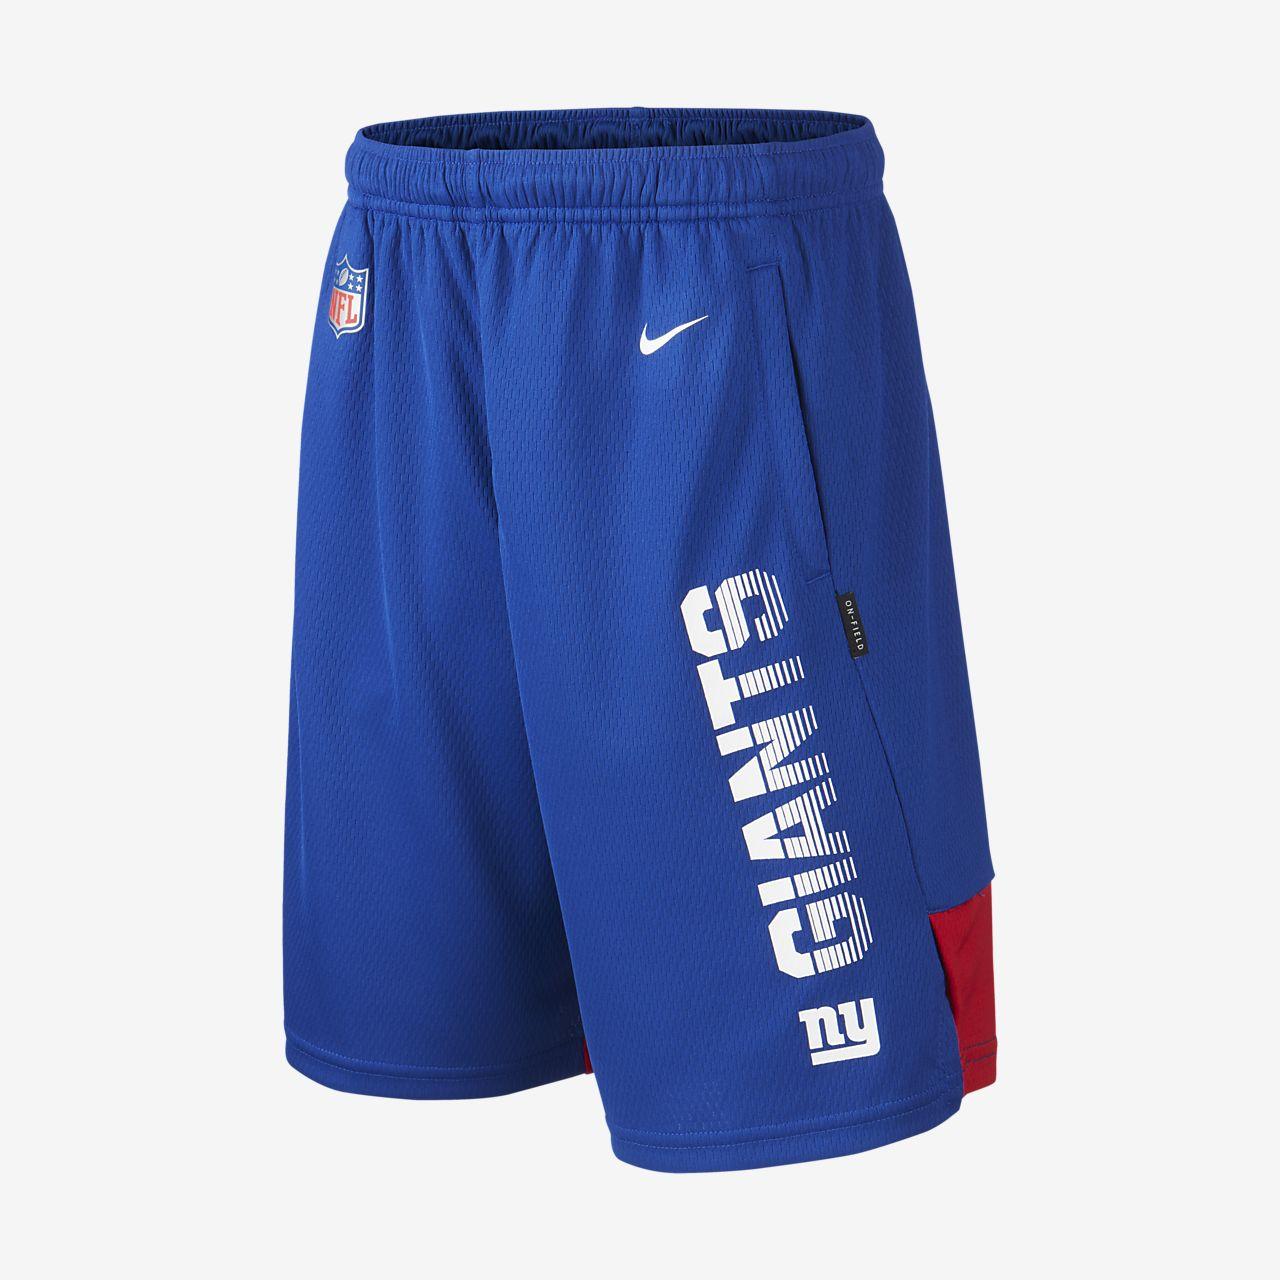 Nike (NFL Giants) Kindershorts